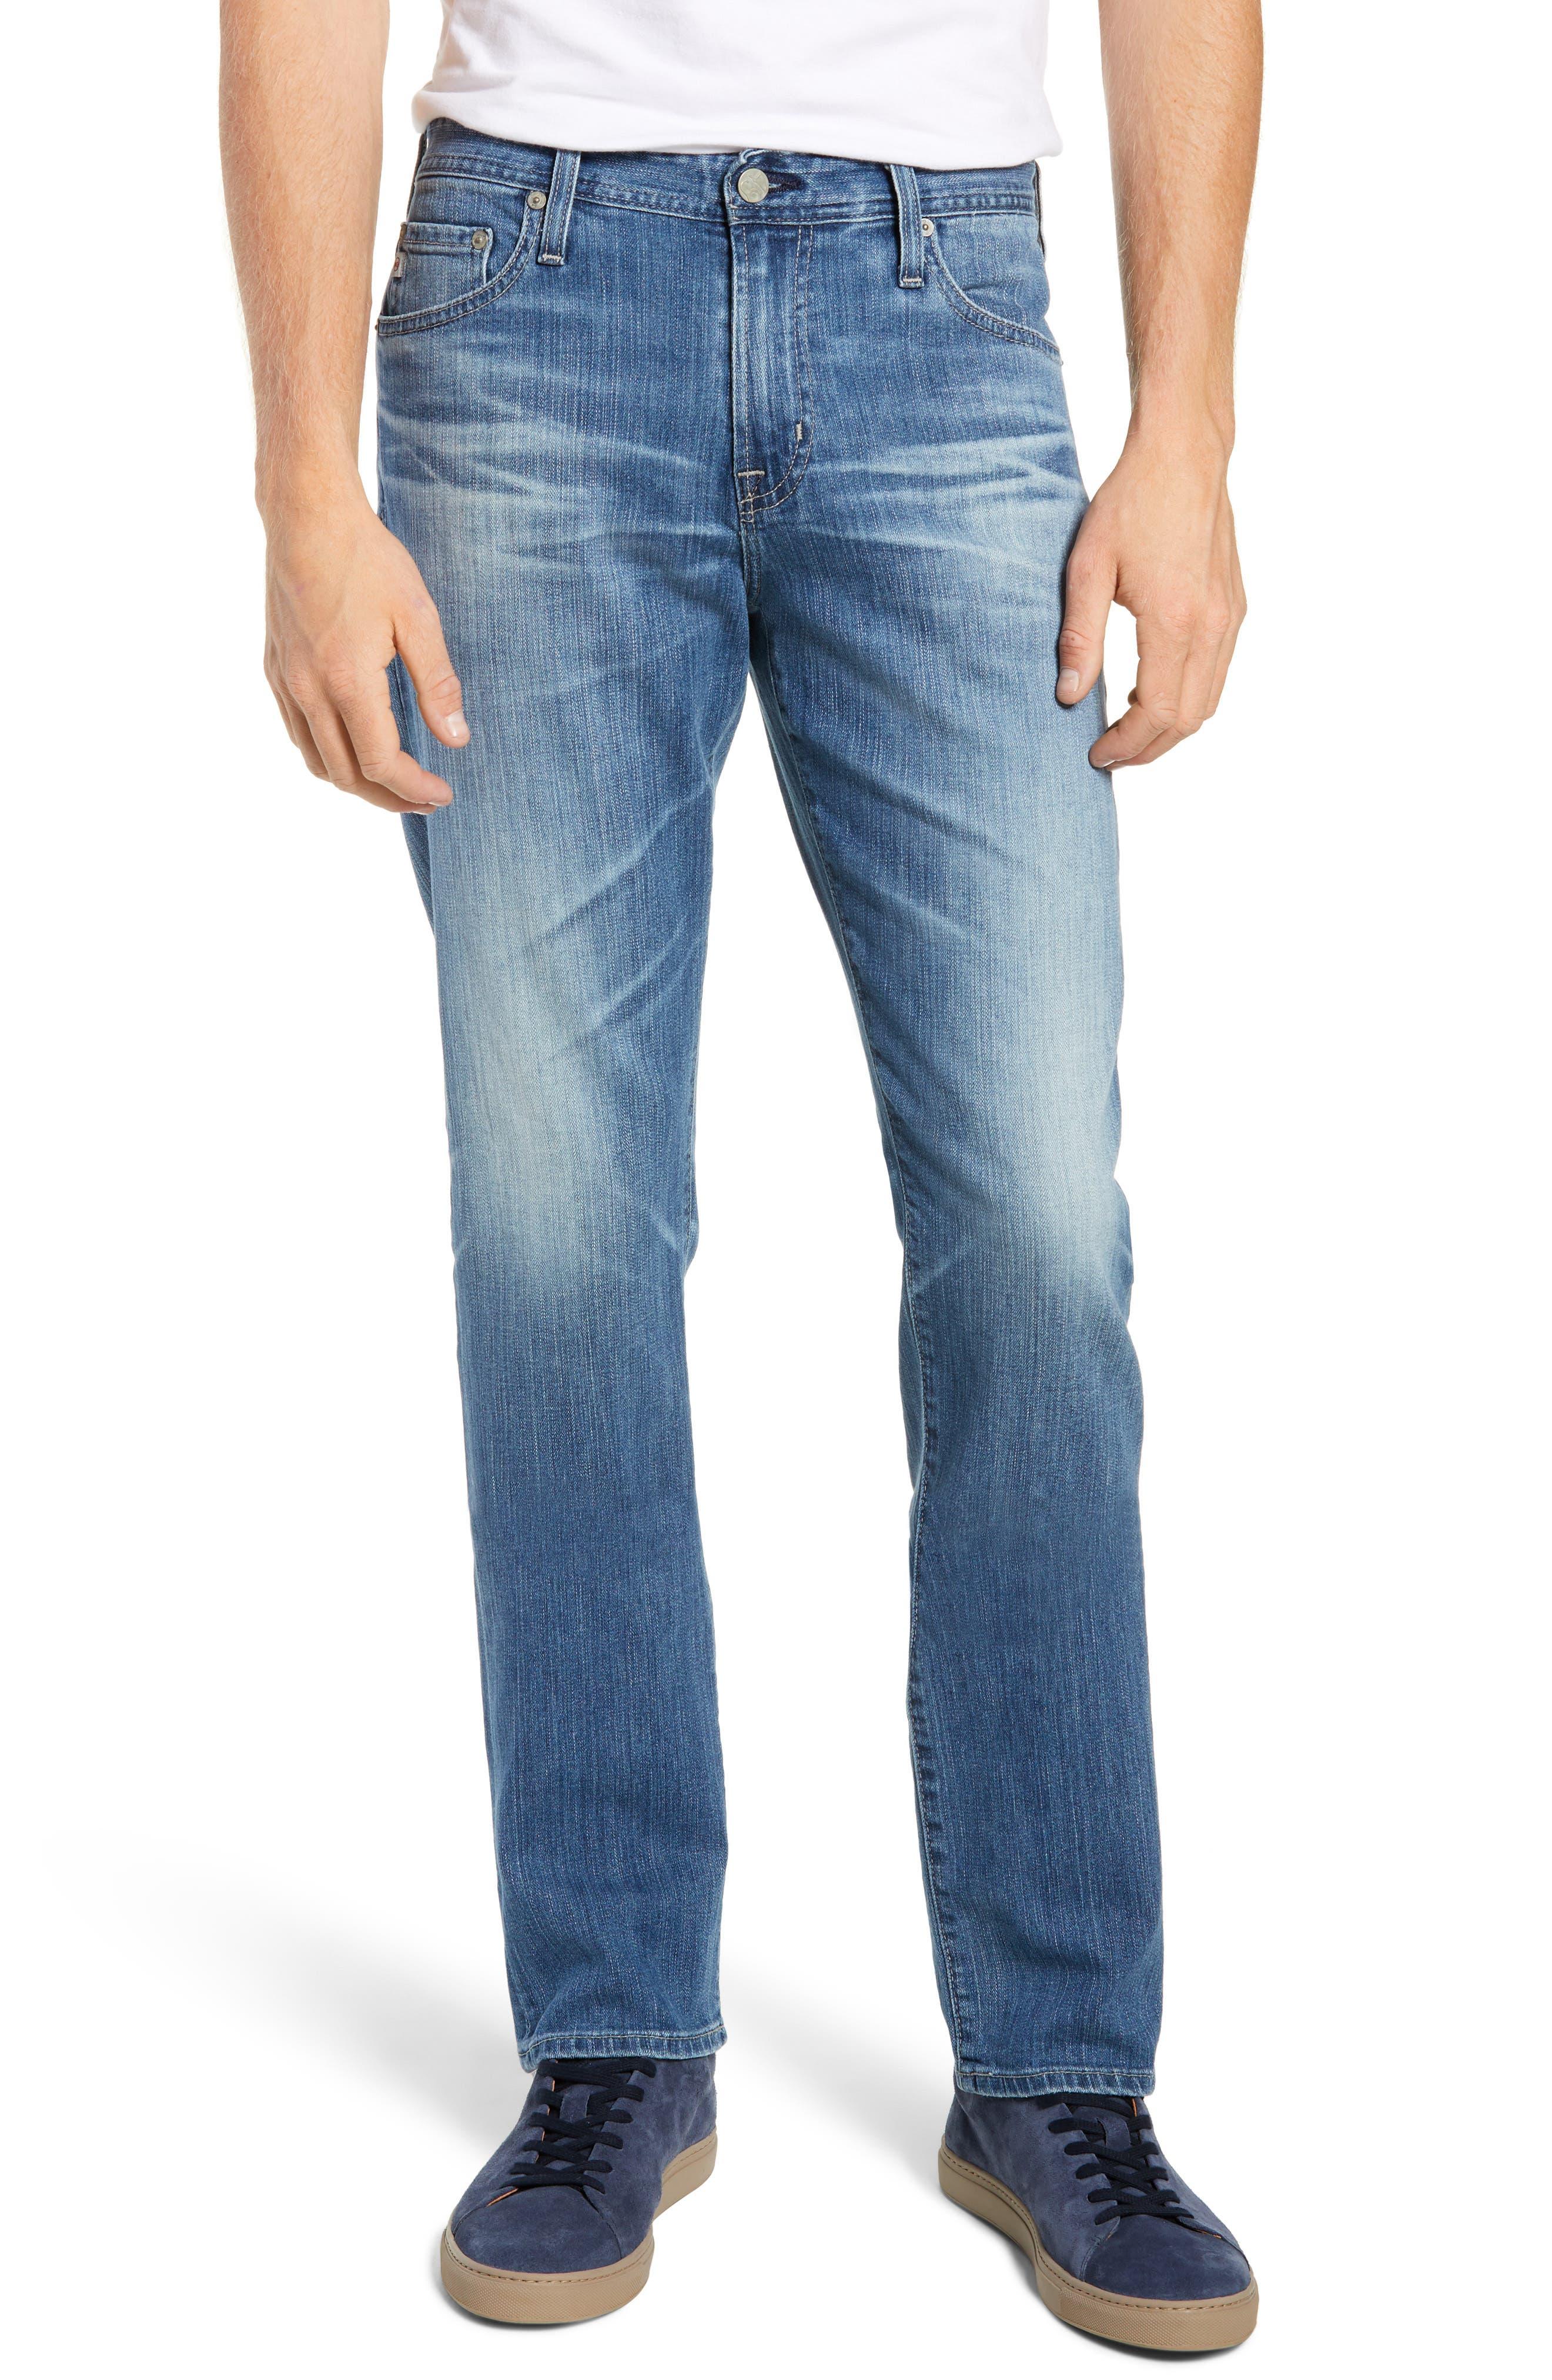 Everett Slim Straight Leg Jeans,                         Main,                         color, 14 YEARS ENGAGEMENT